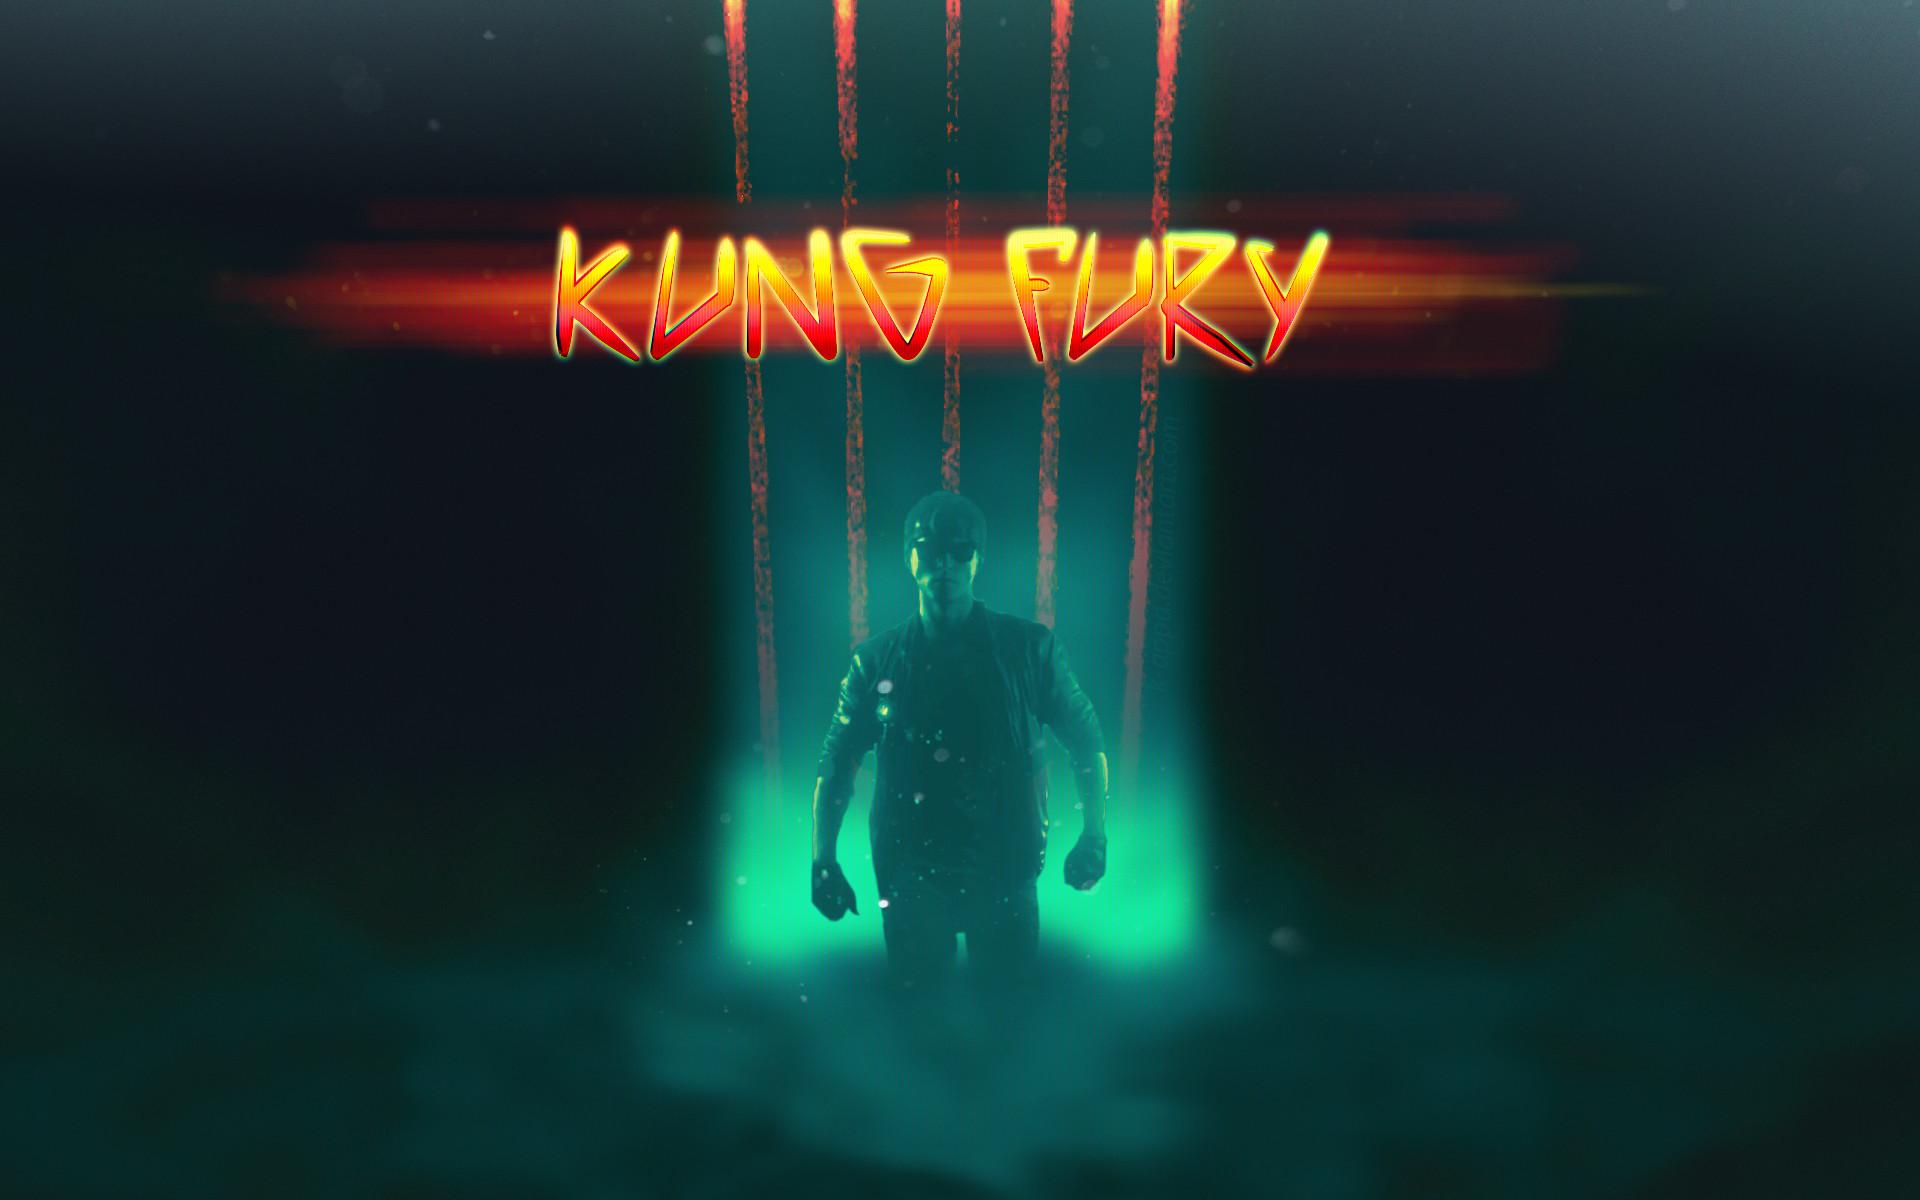 … Kung Fury Wallpaper by K-appa